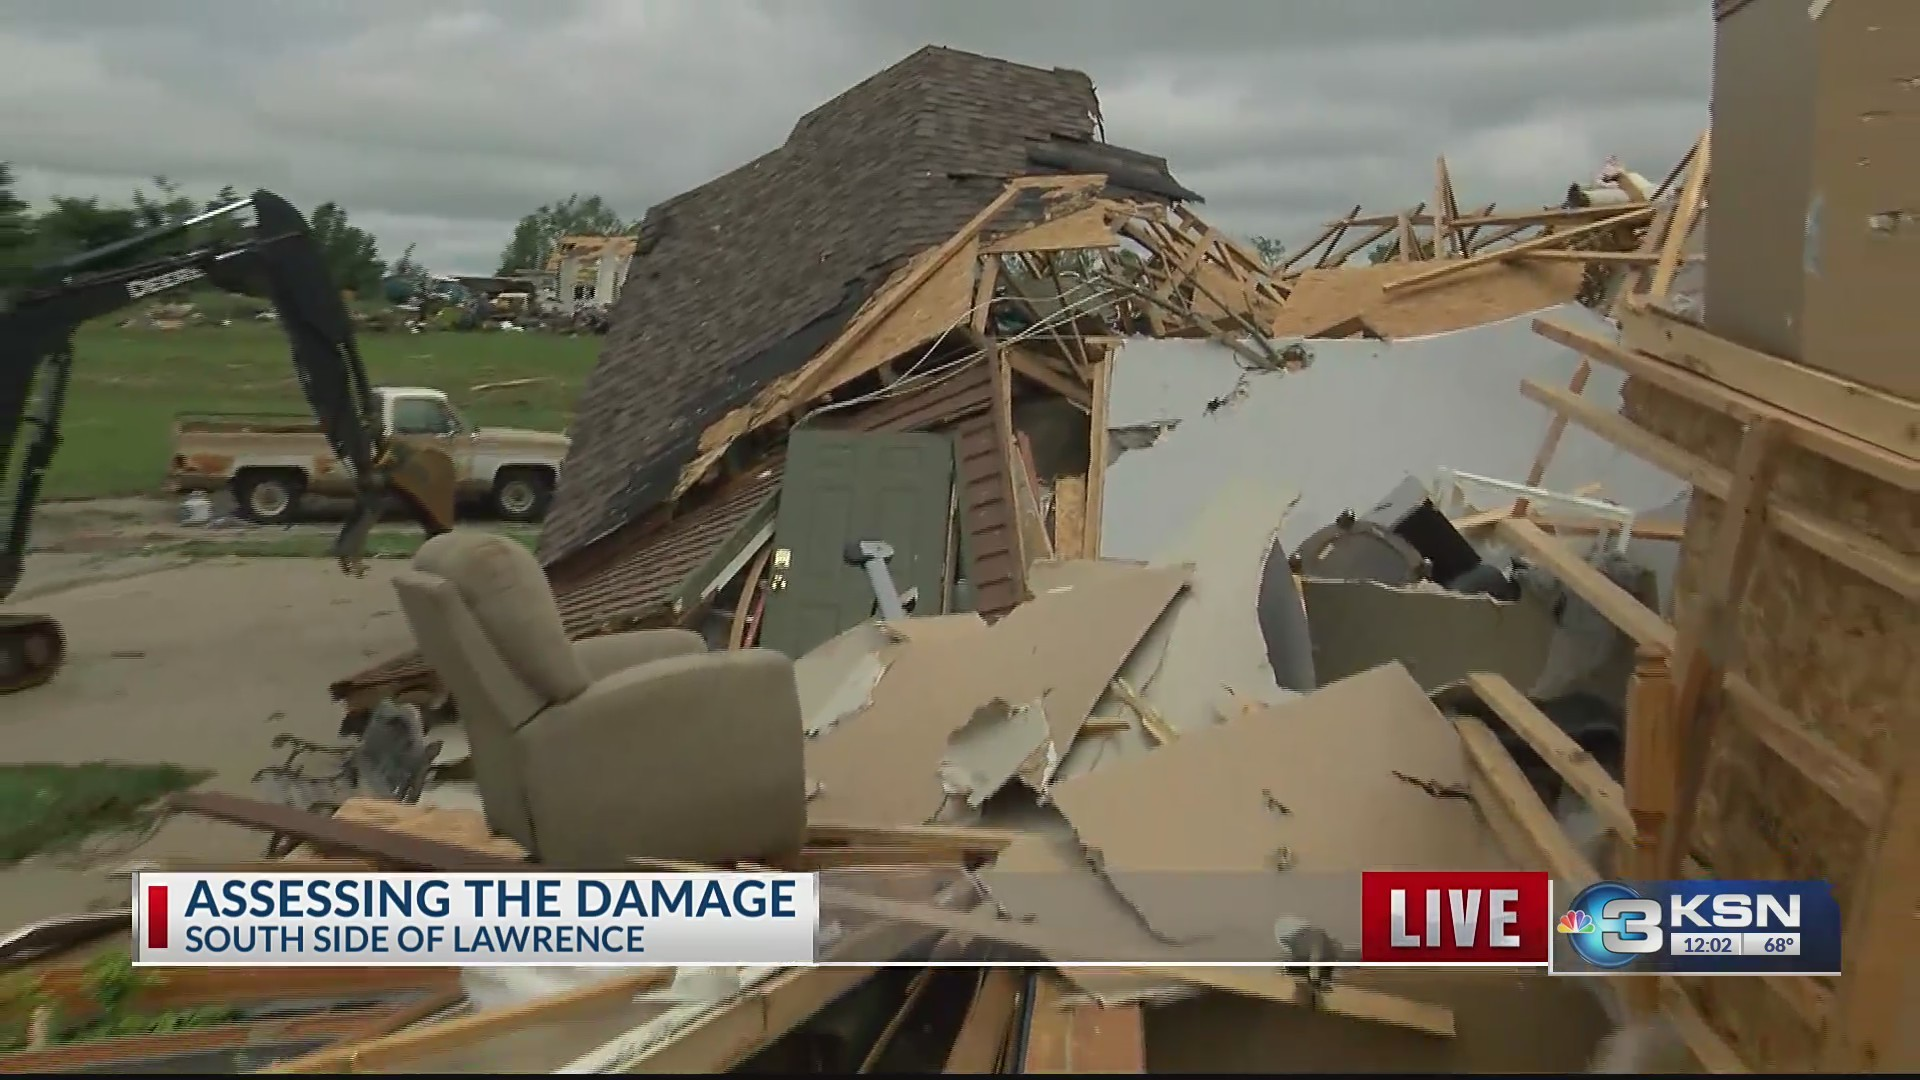 KSN_gets_look_at_tornado_devastation_sou_0_20190529171547